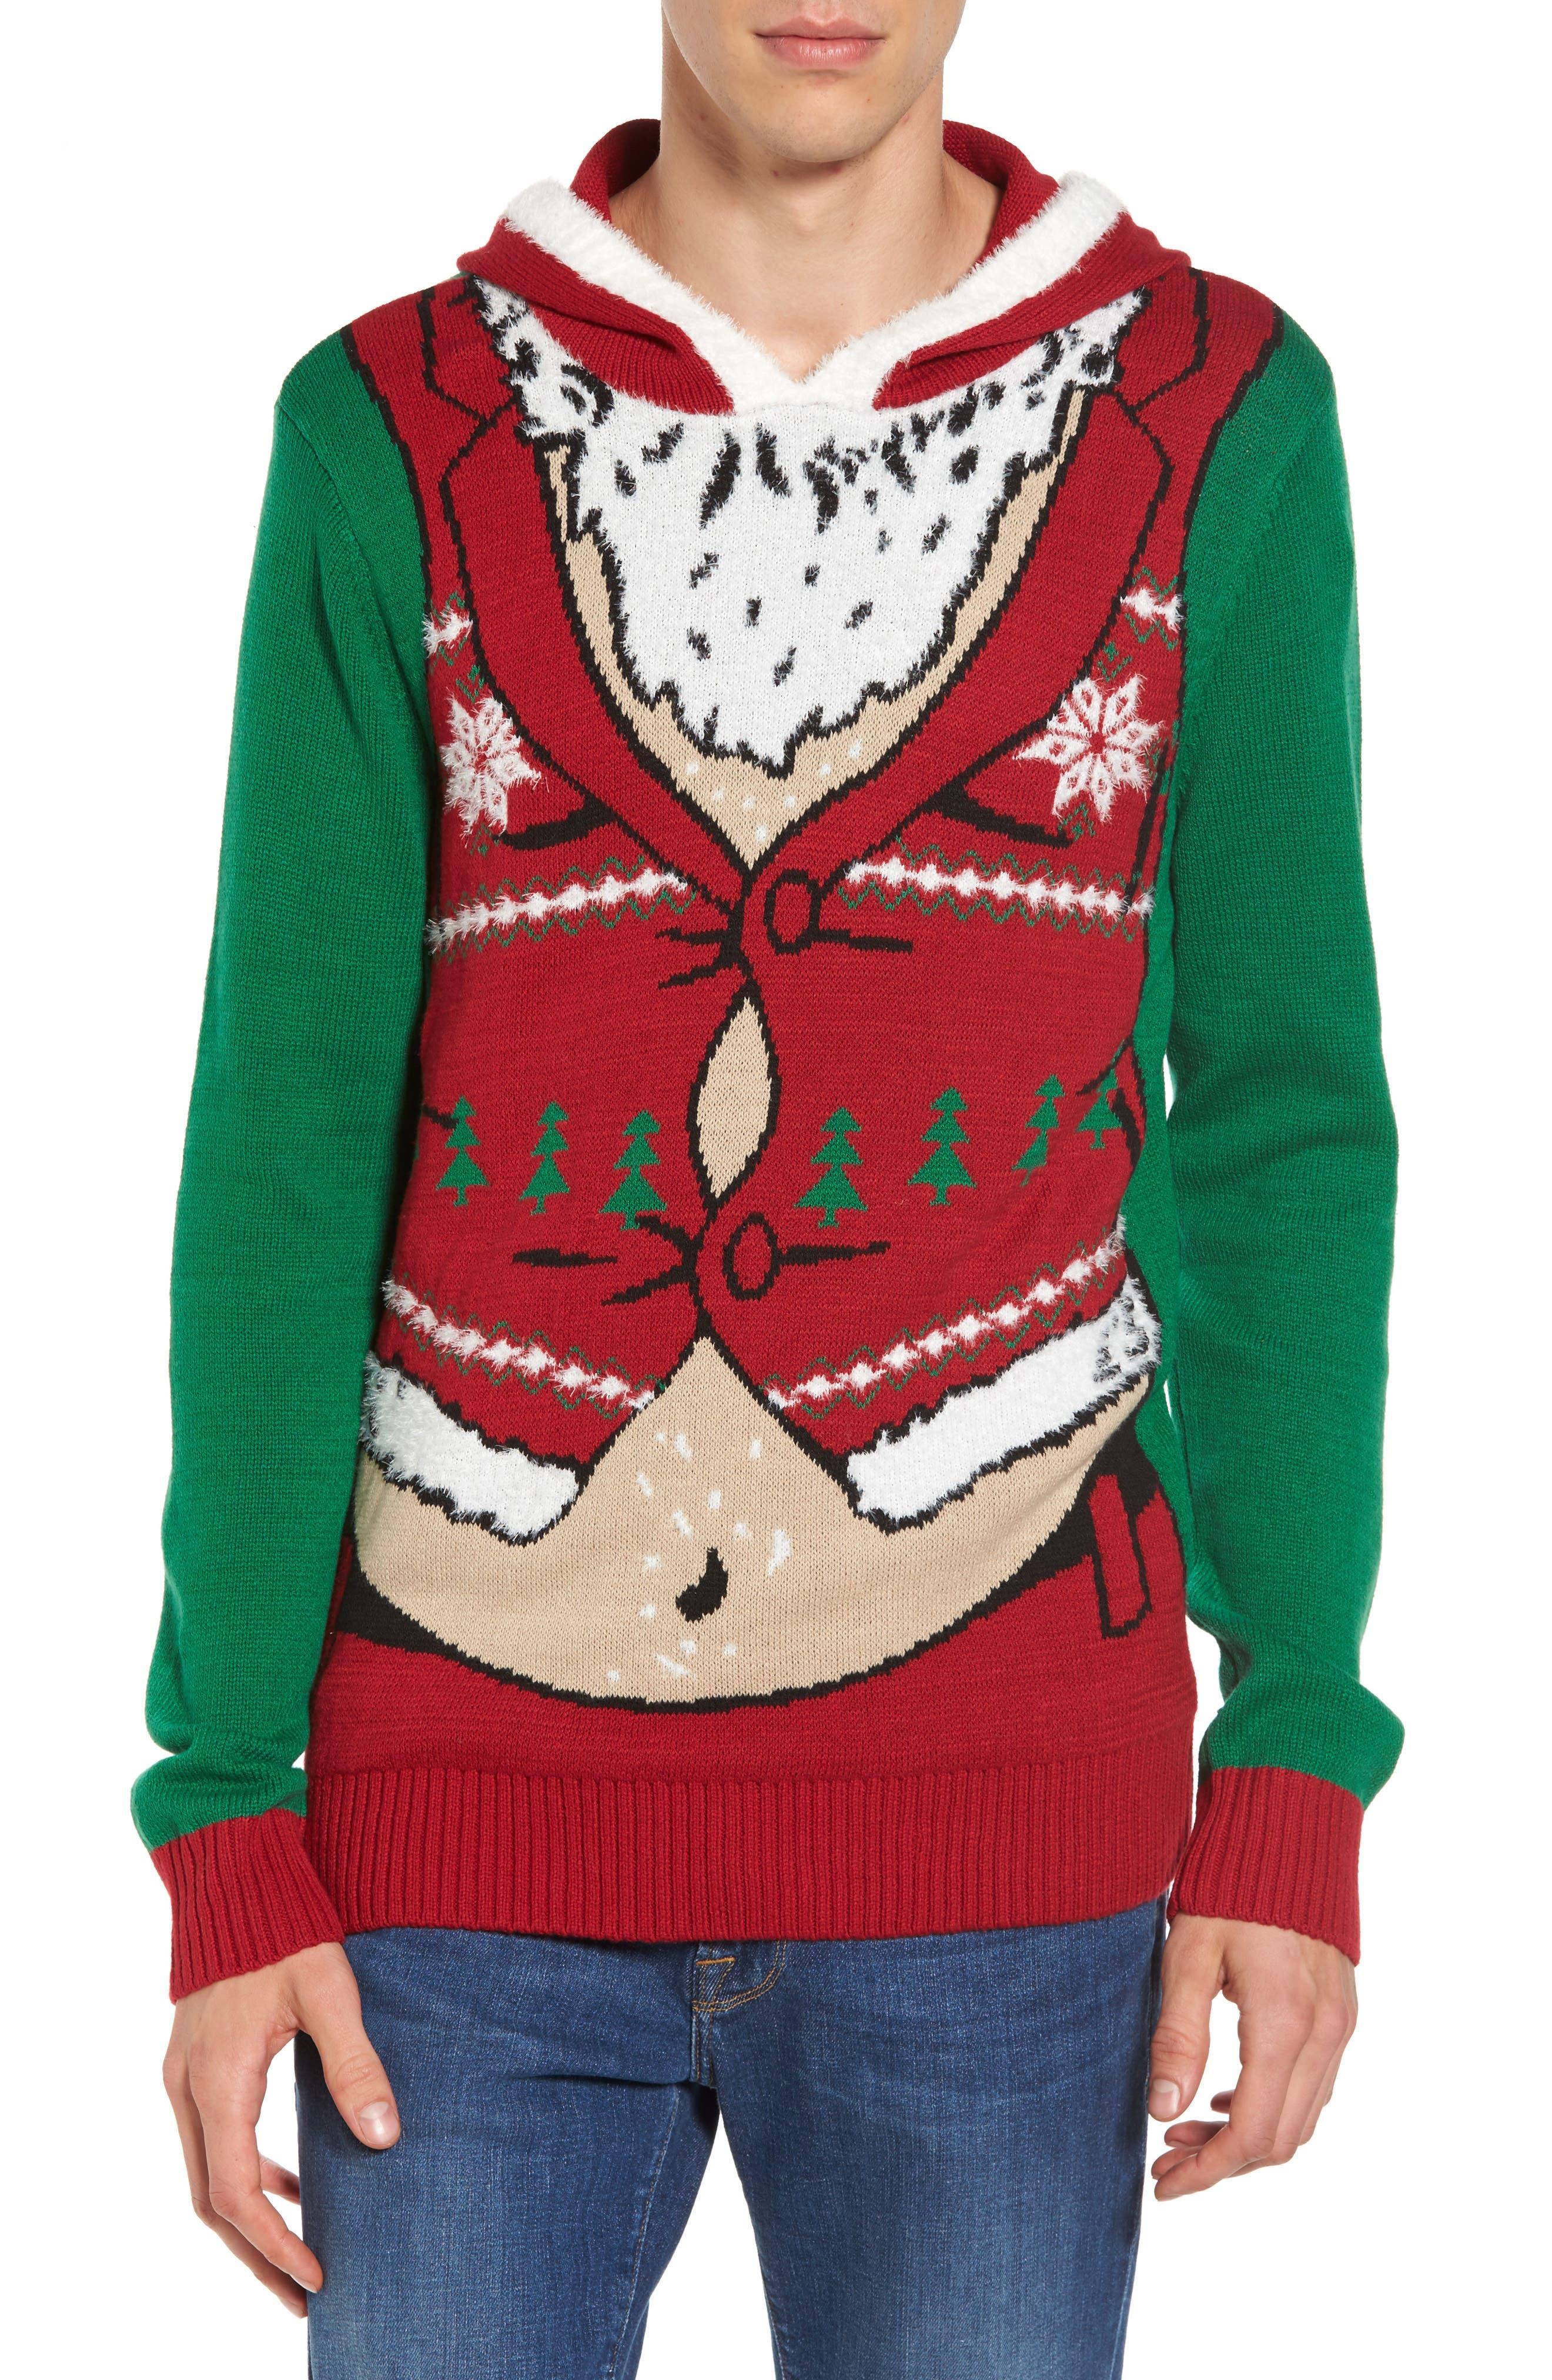 The Rail Santa Hoodie Sweater